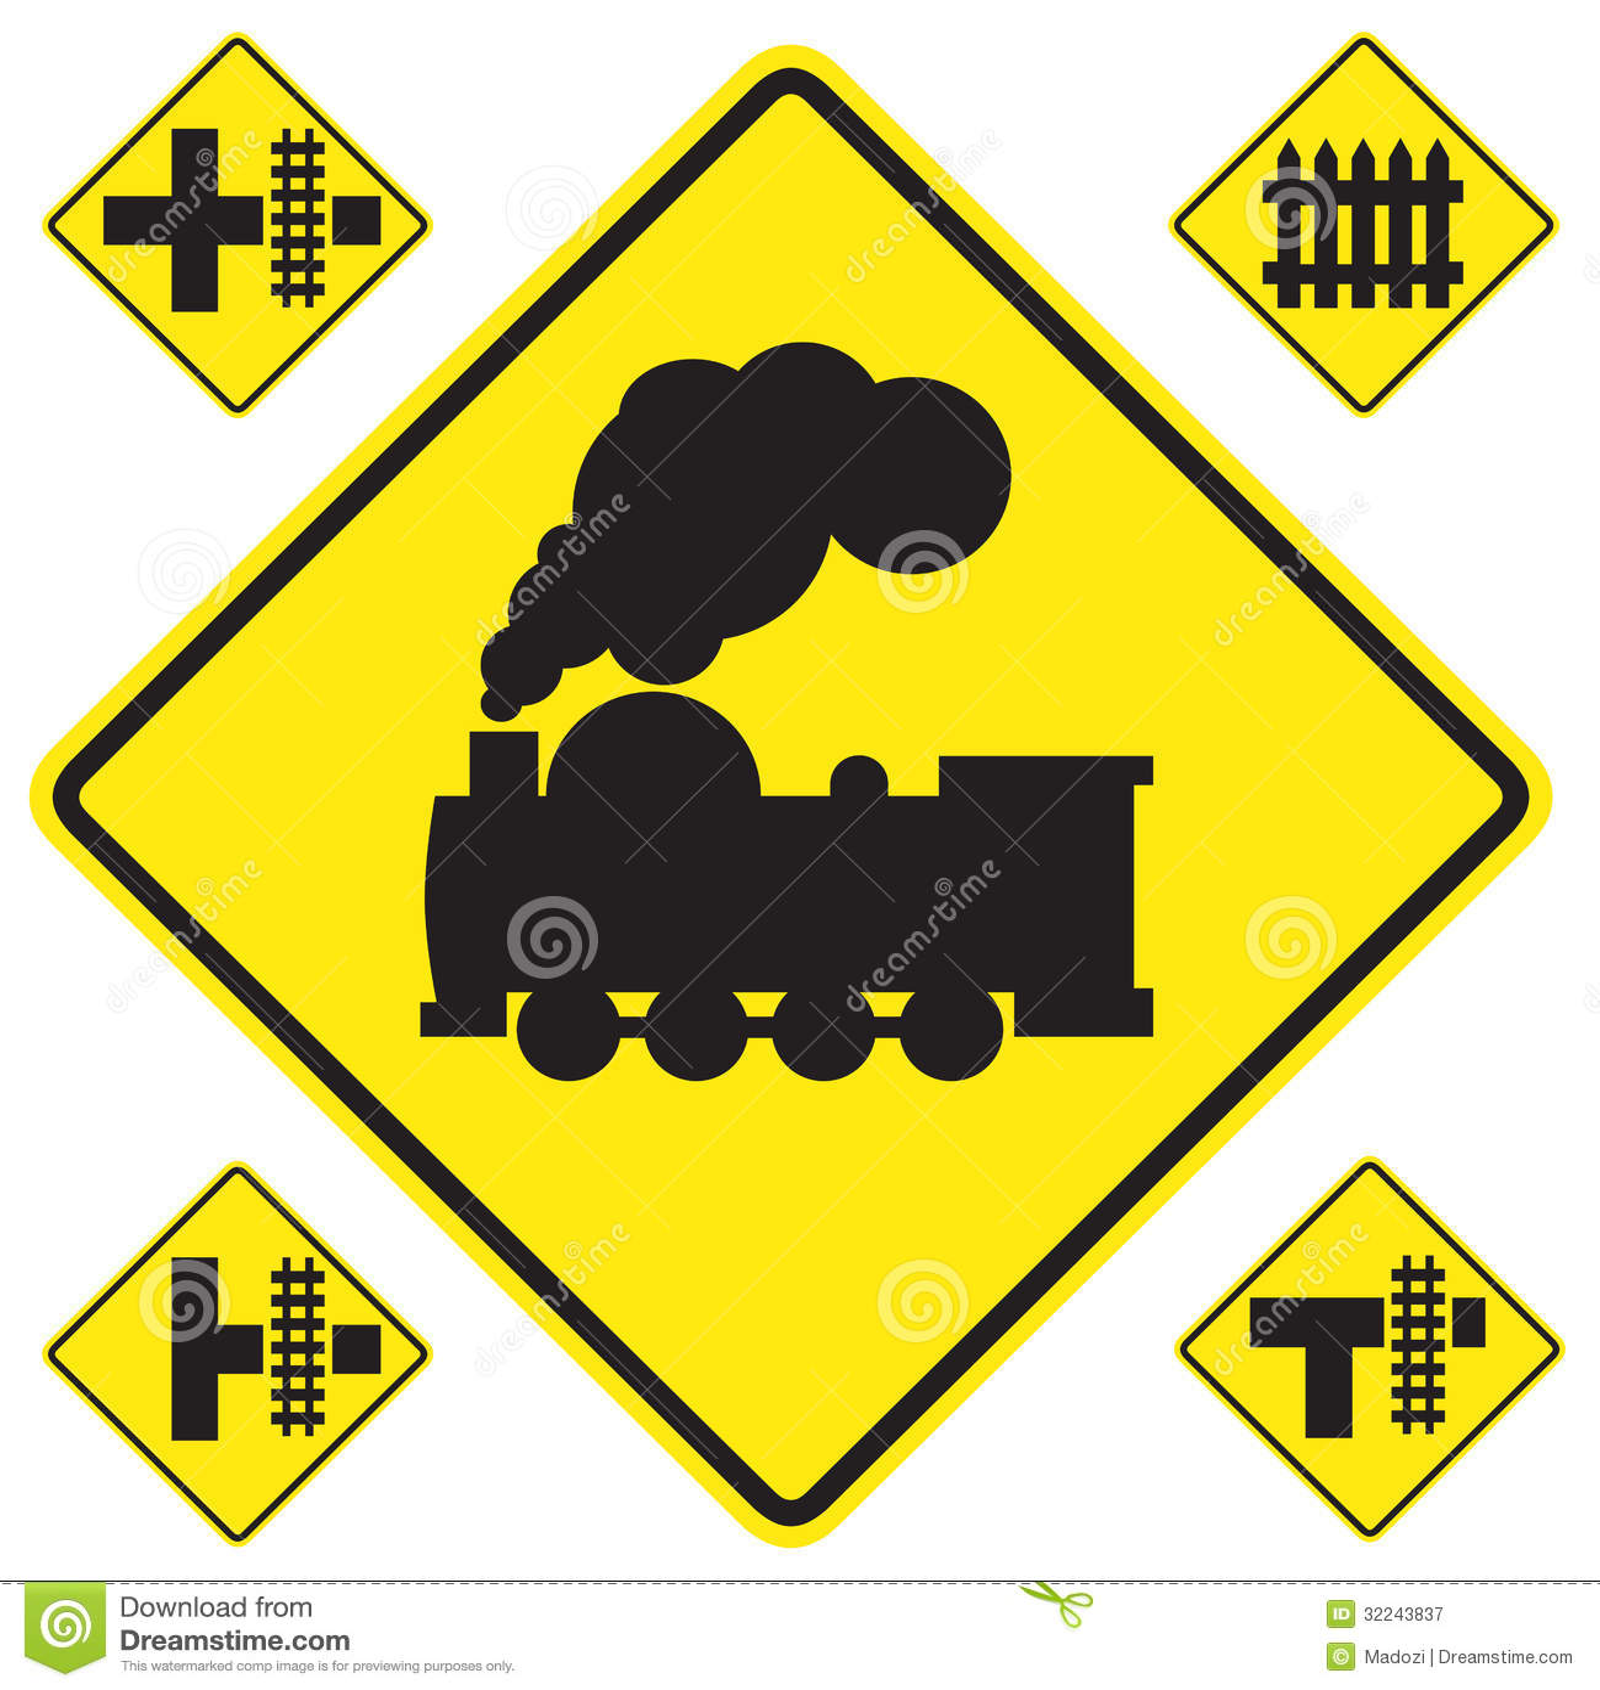 Railroad Warning Sign: Aldon Railroad Safety Signs – kitchen